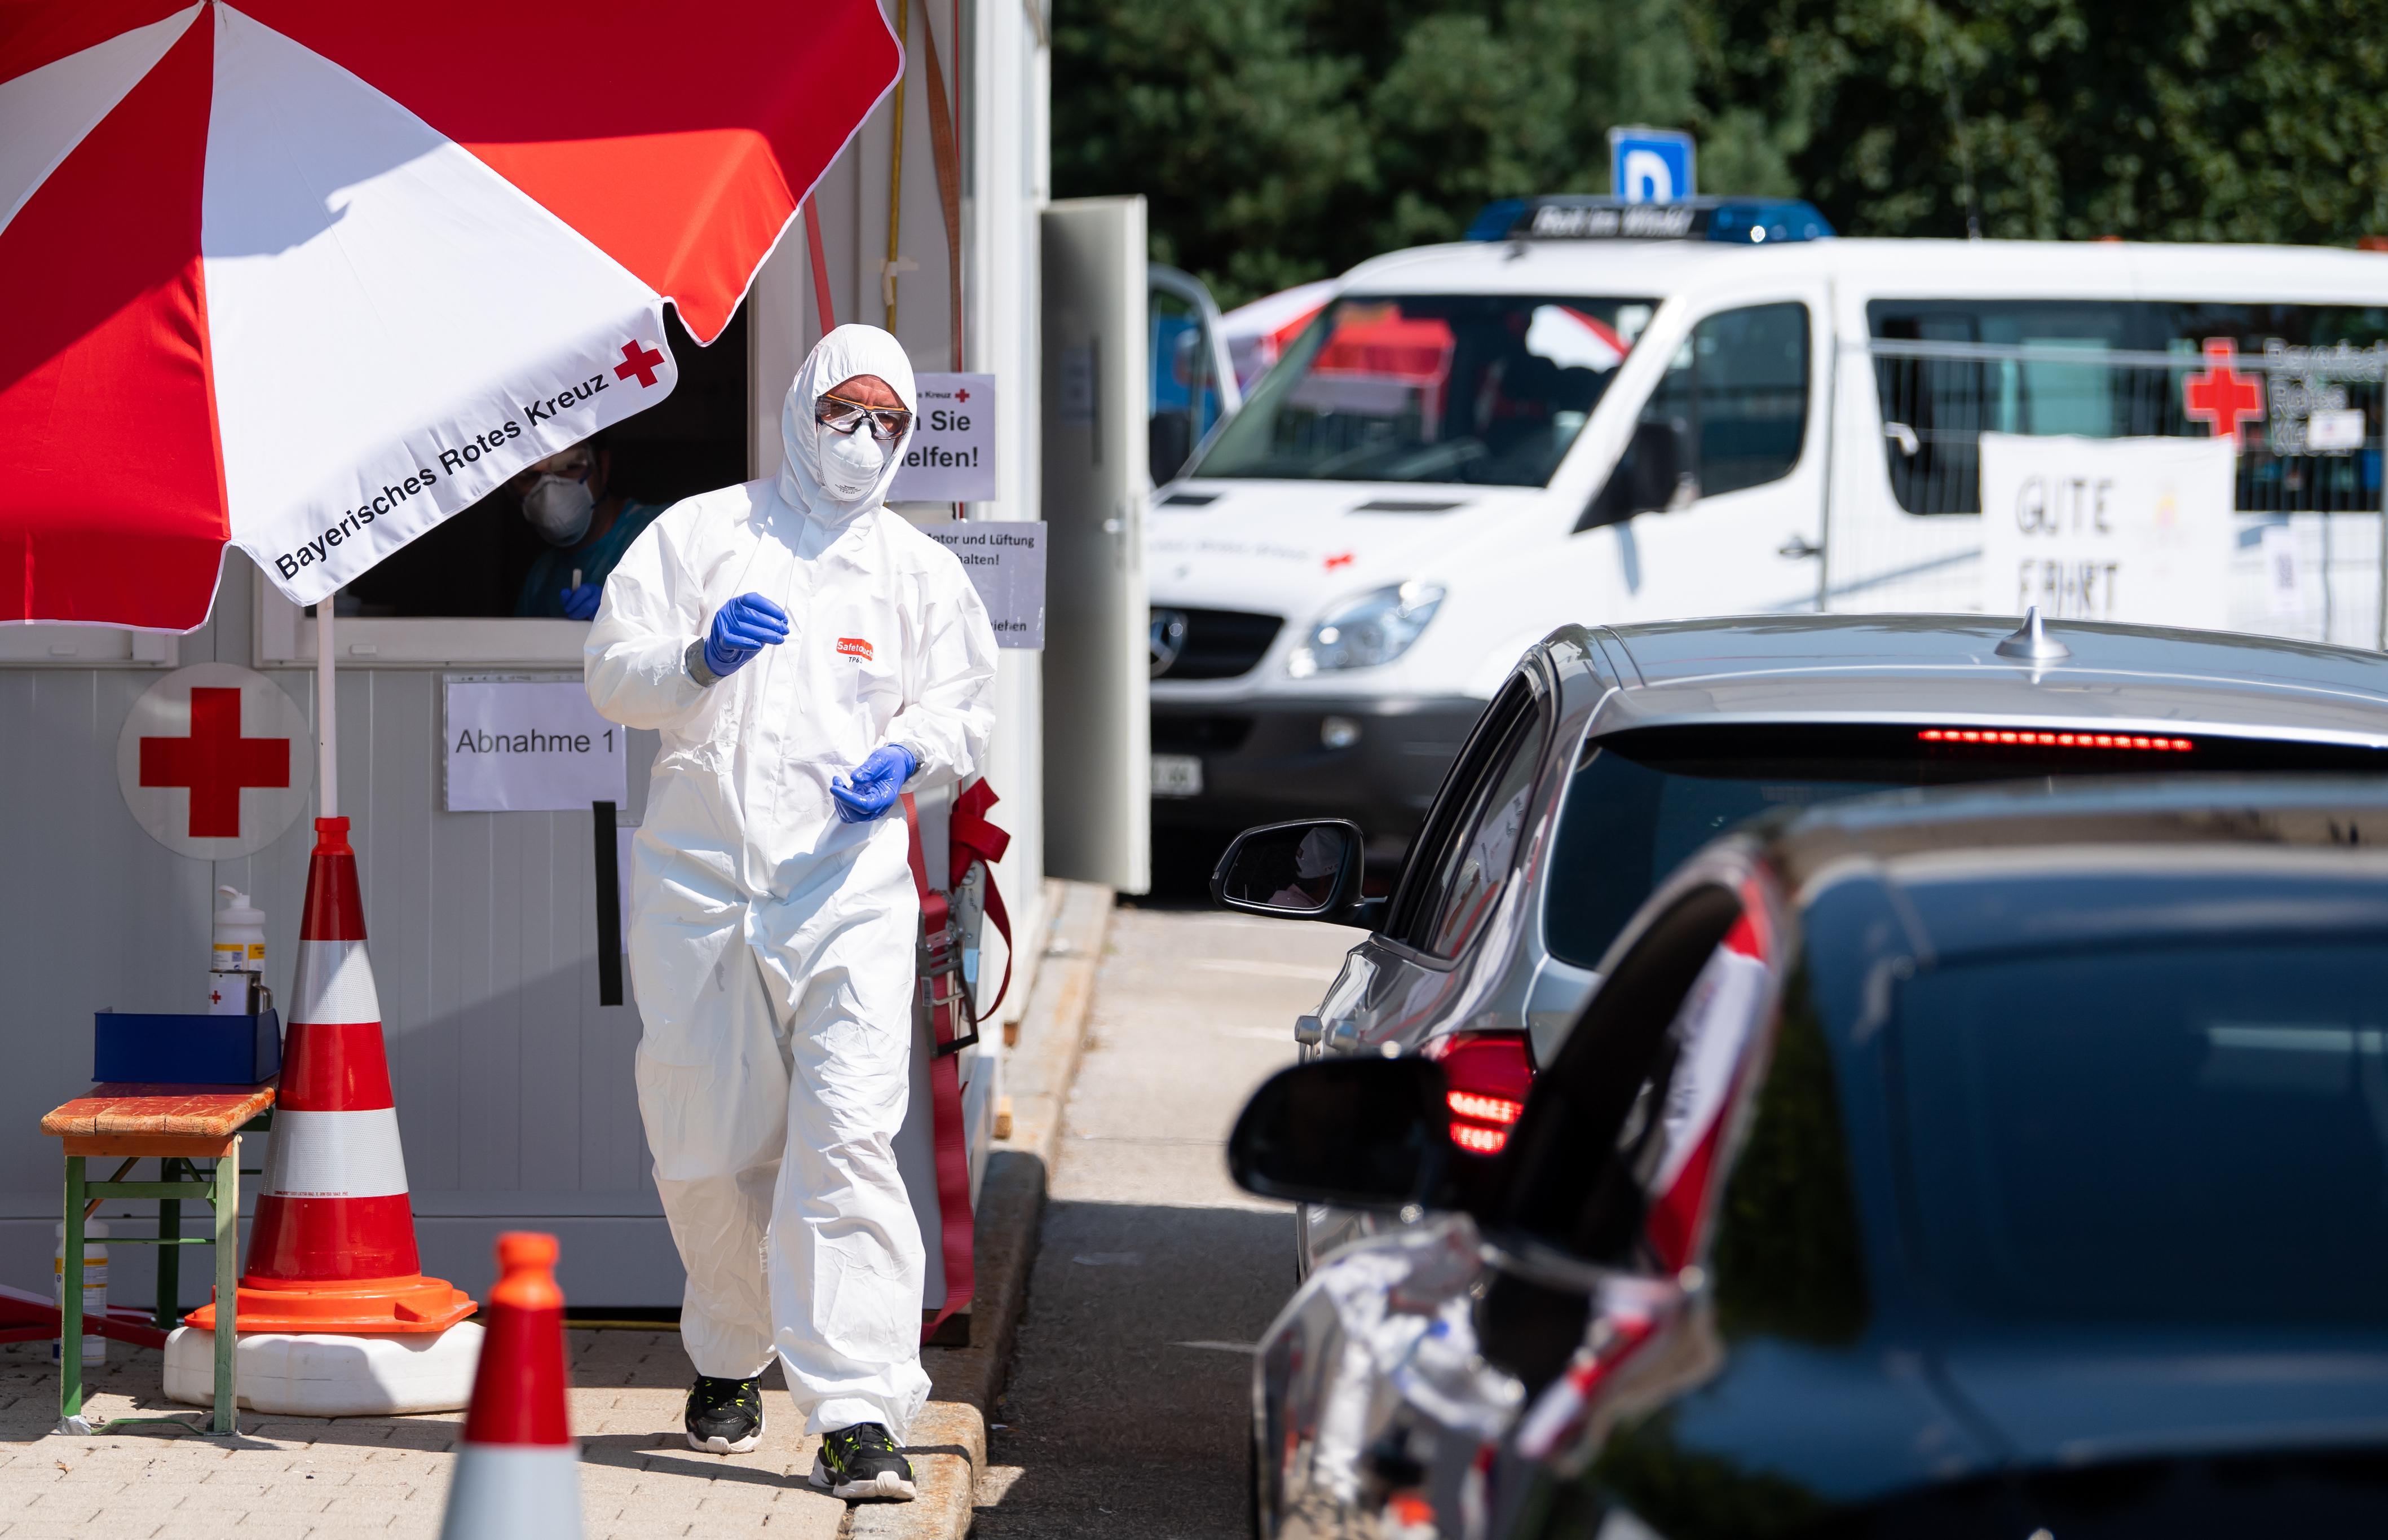 Grenzwert überschritten: Rosenheim erlässt Corona-Beschränkungen - Über 50 Neuinfektionen